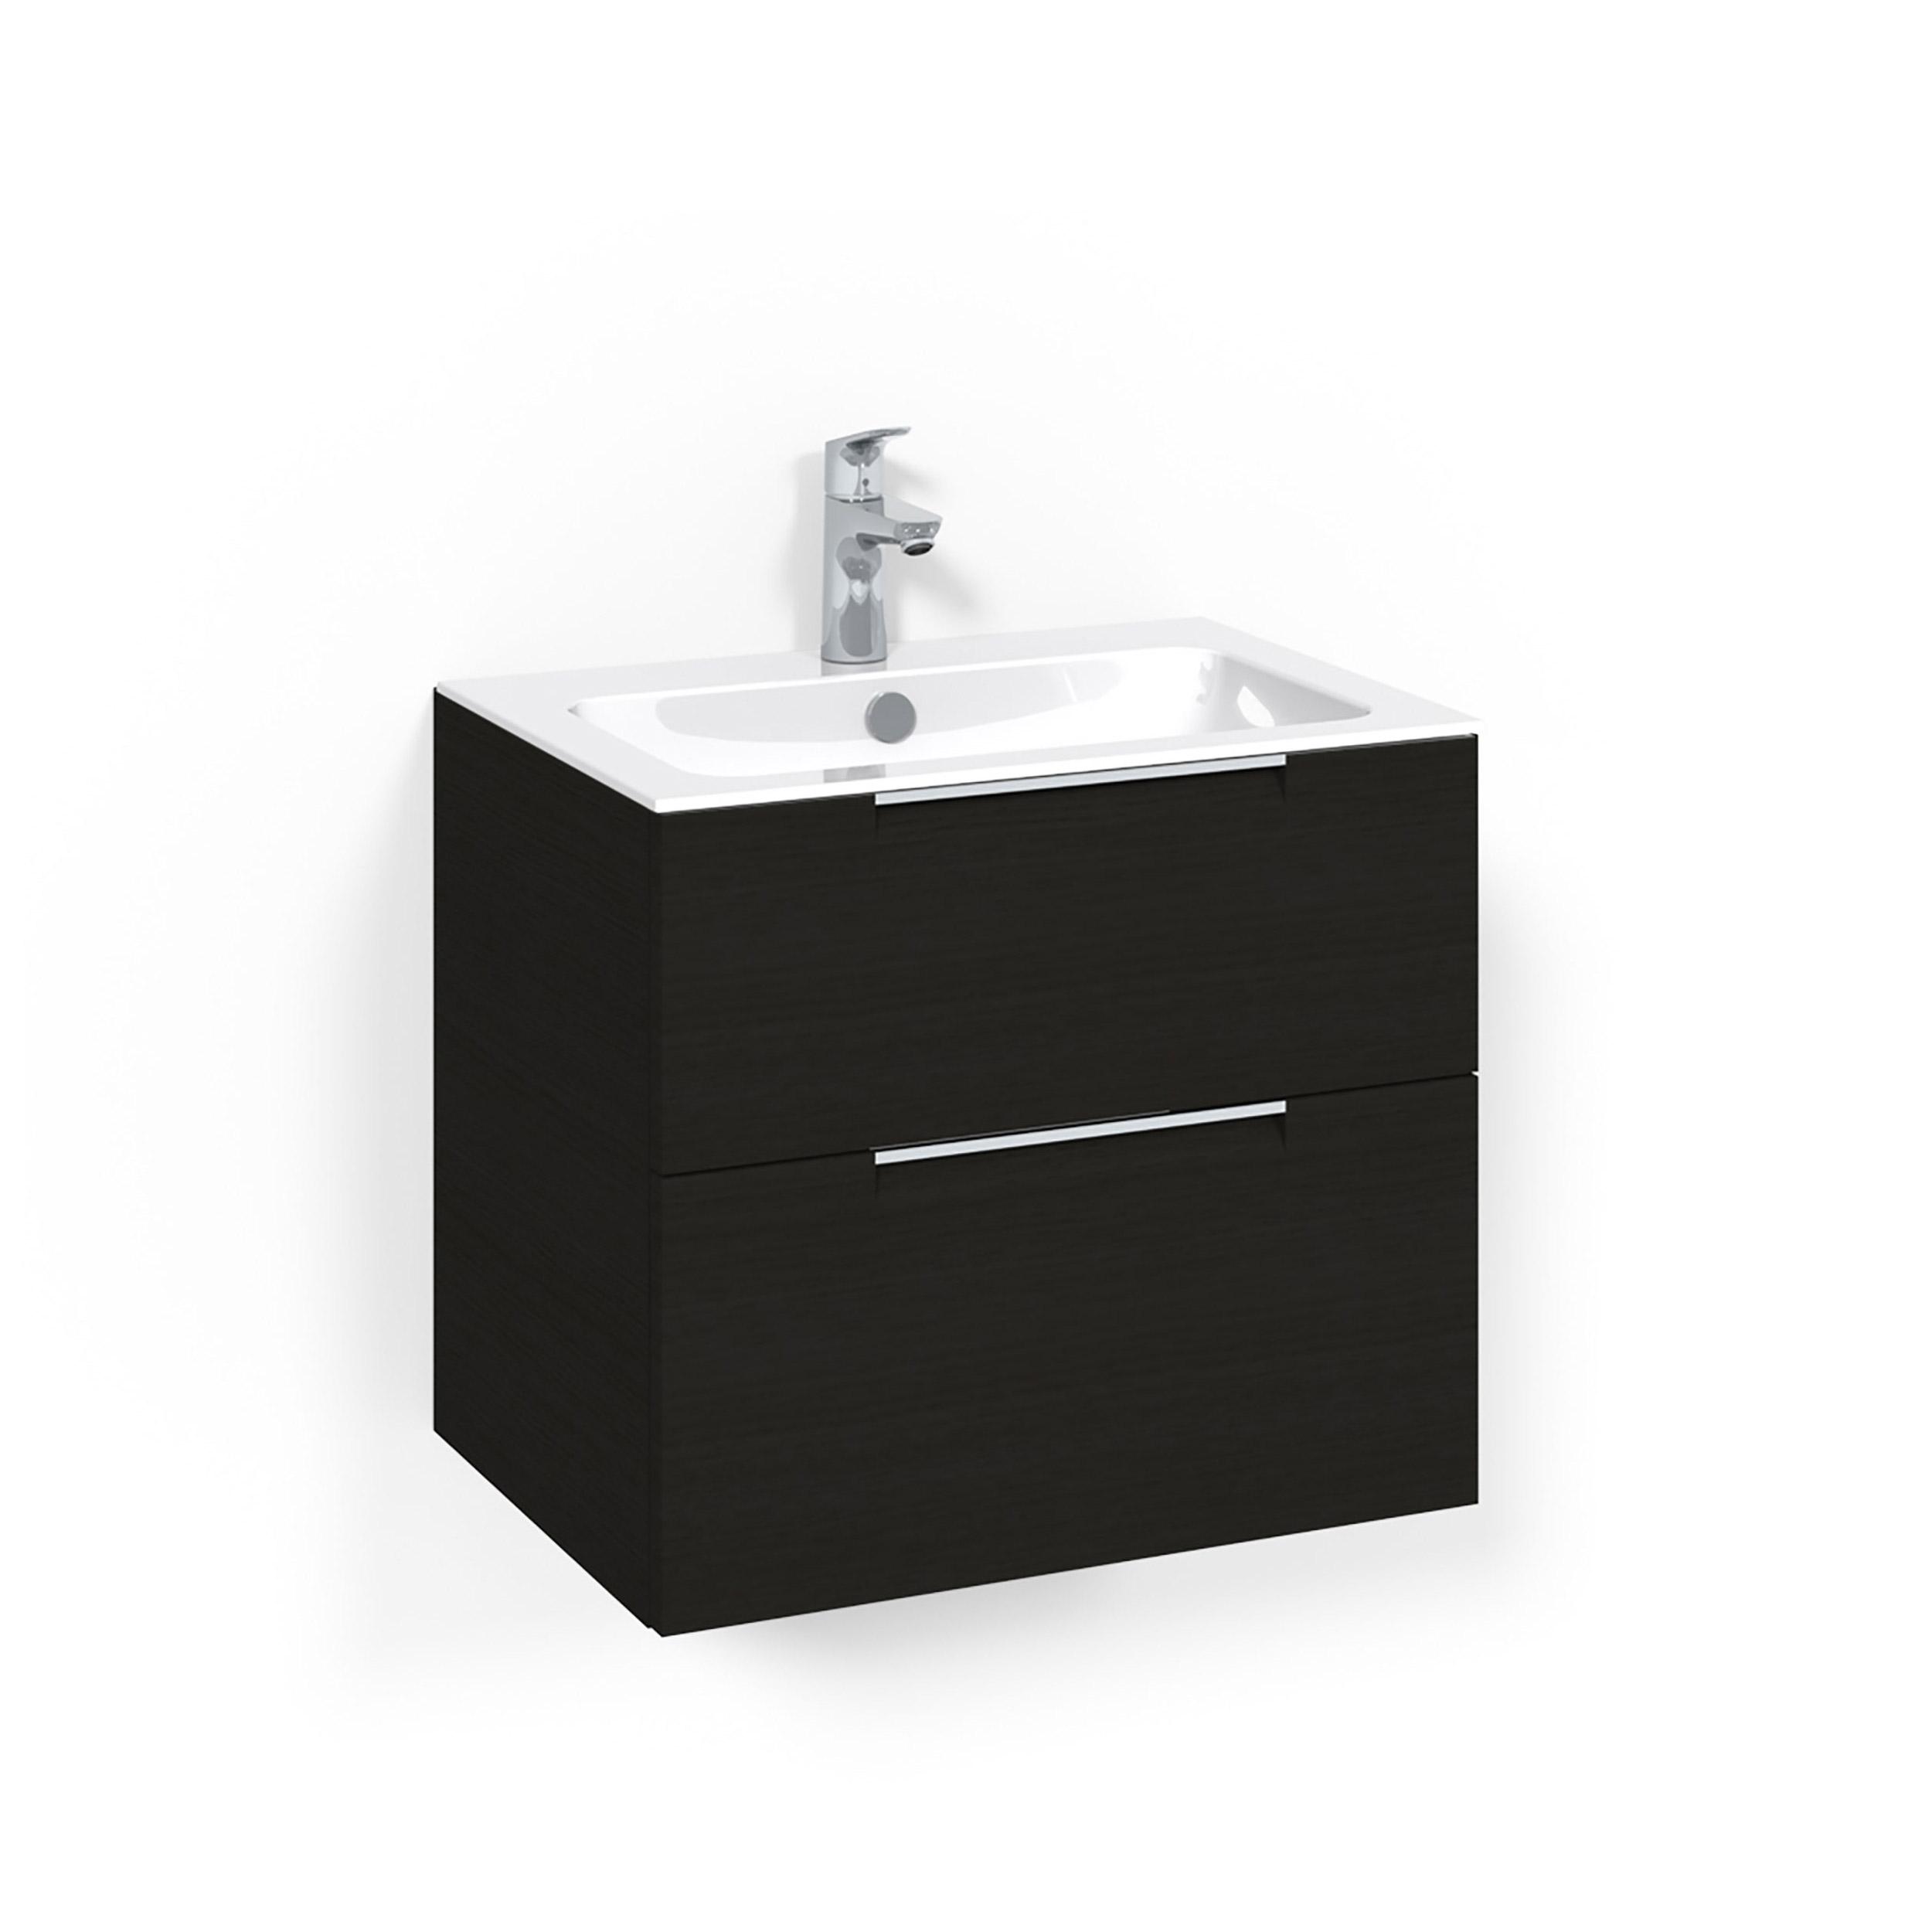 Tvättställsskåp Macro Design Crown Grip